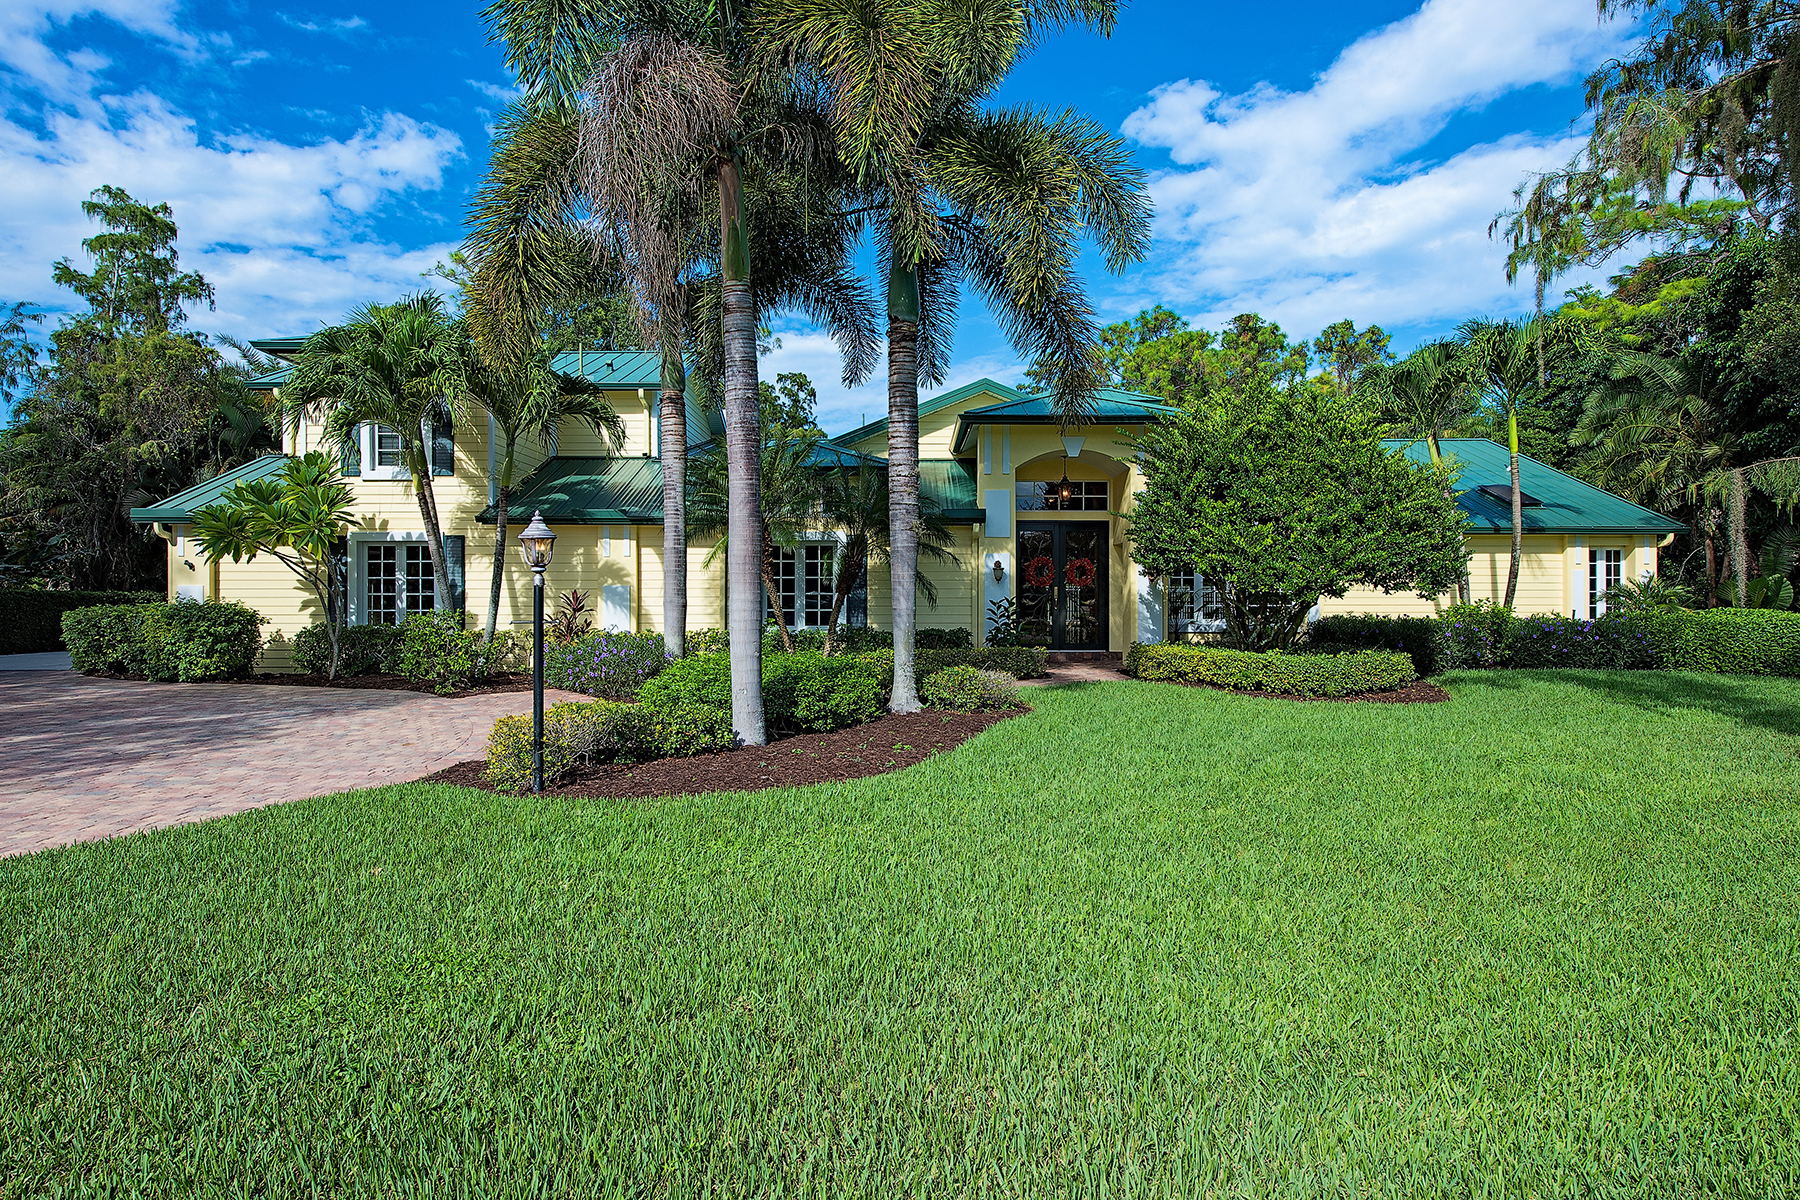 獨棟家庭住宅 為 出售 在 QUAIL CREEK 13001 White Violet Dr Quail Creek, Naples, 佛羅里達州, 34119 美國